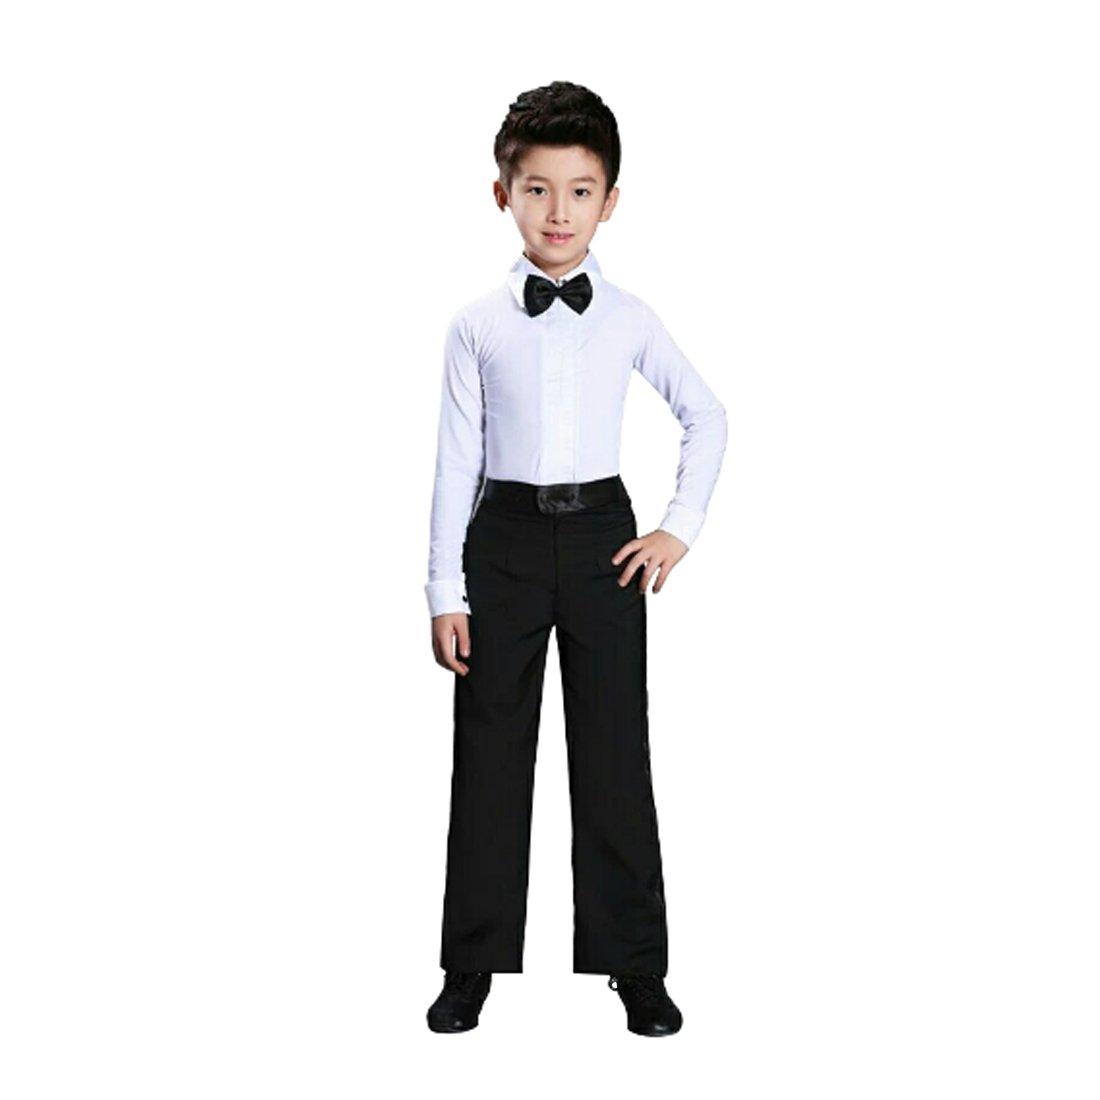 Yefree Dance Mens Latin Top Boys Dance Leotard Costumes Modern Latin Ballroom Dance Wear White Black